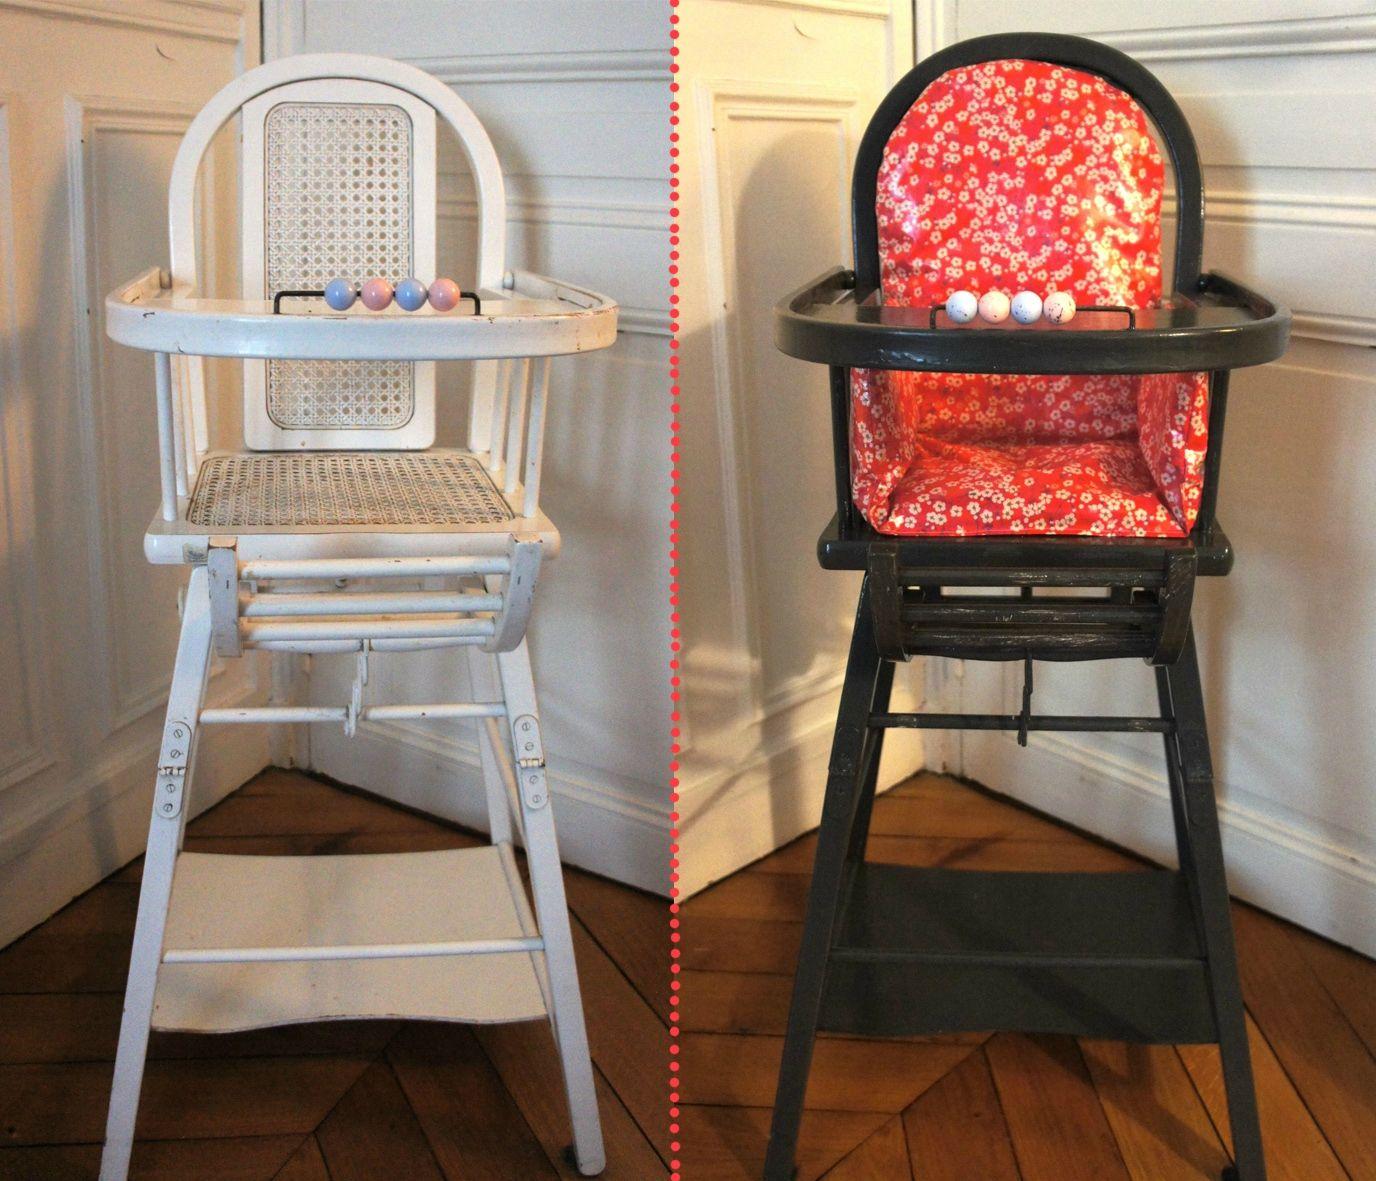 Les Lundis Telechargeables Coussin Chaise Haute Ernest Est Celeste Coussin Chaise Haute Chaise Haute Coussin Chaise